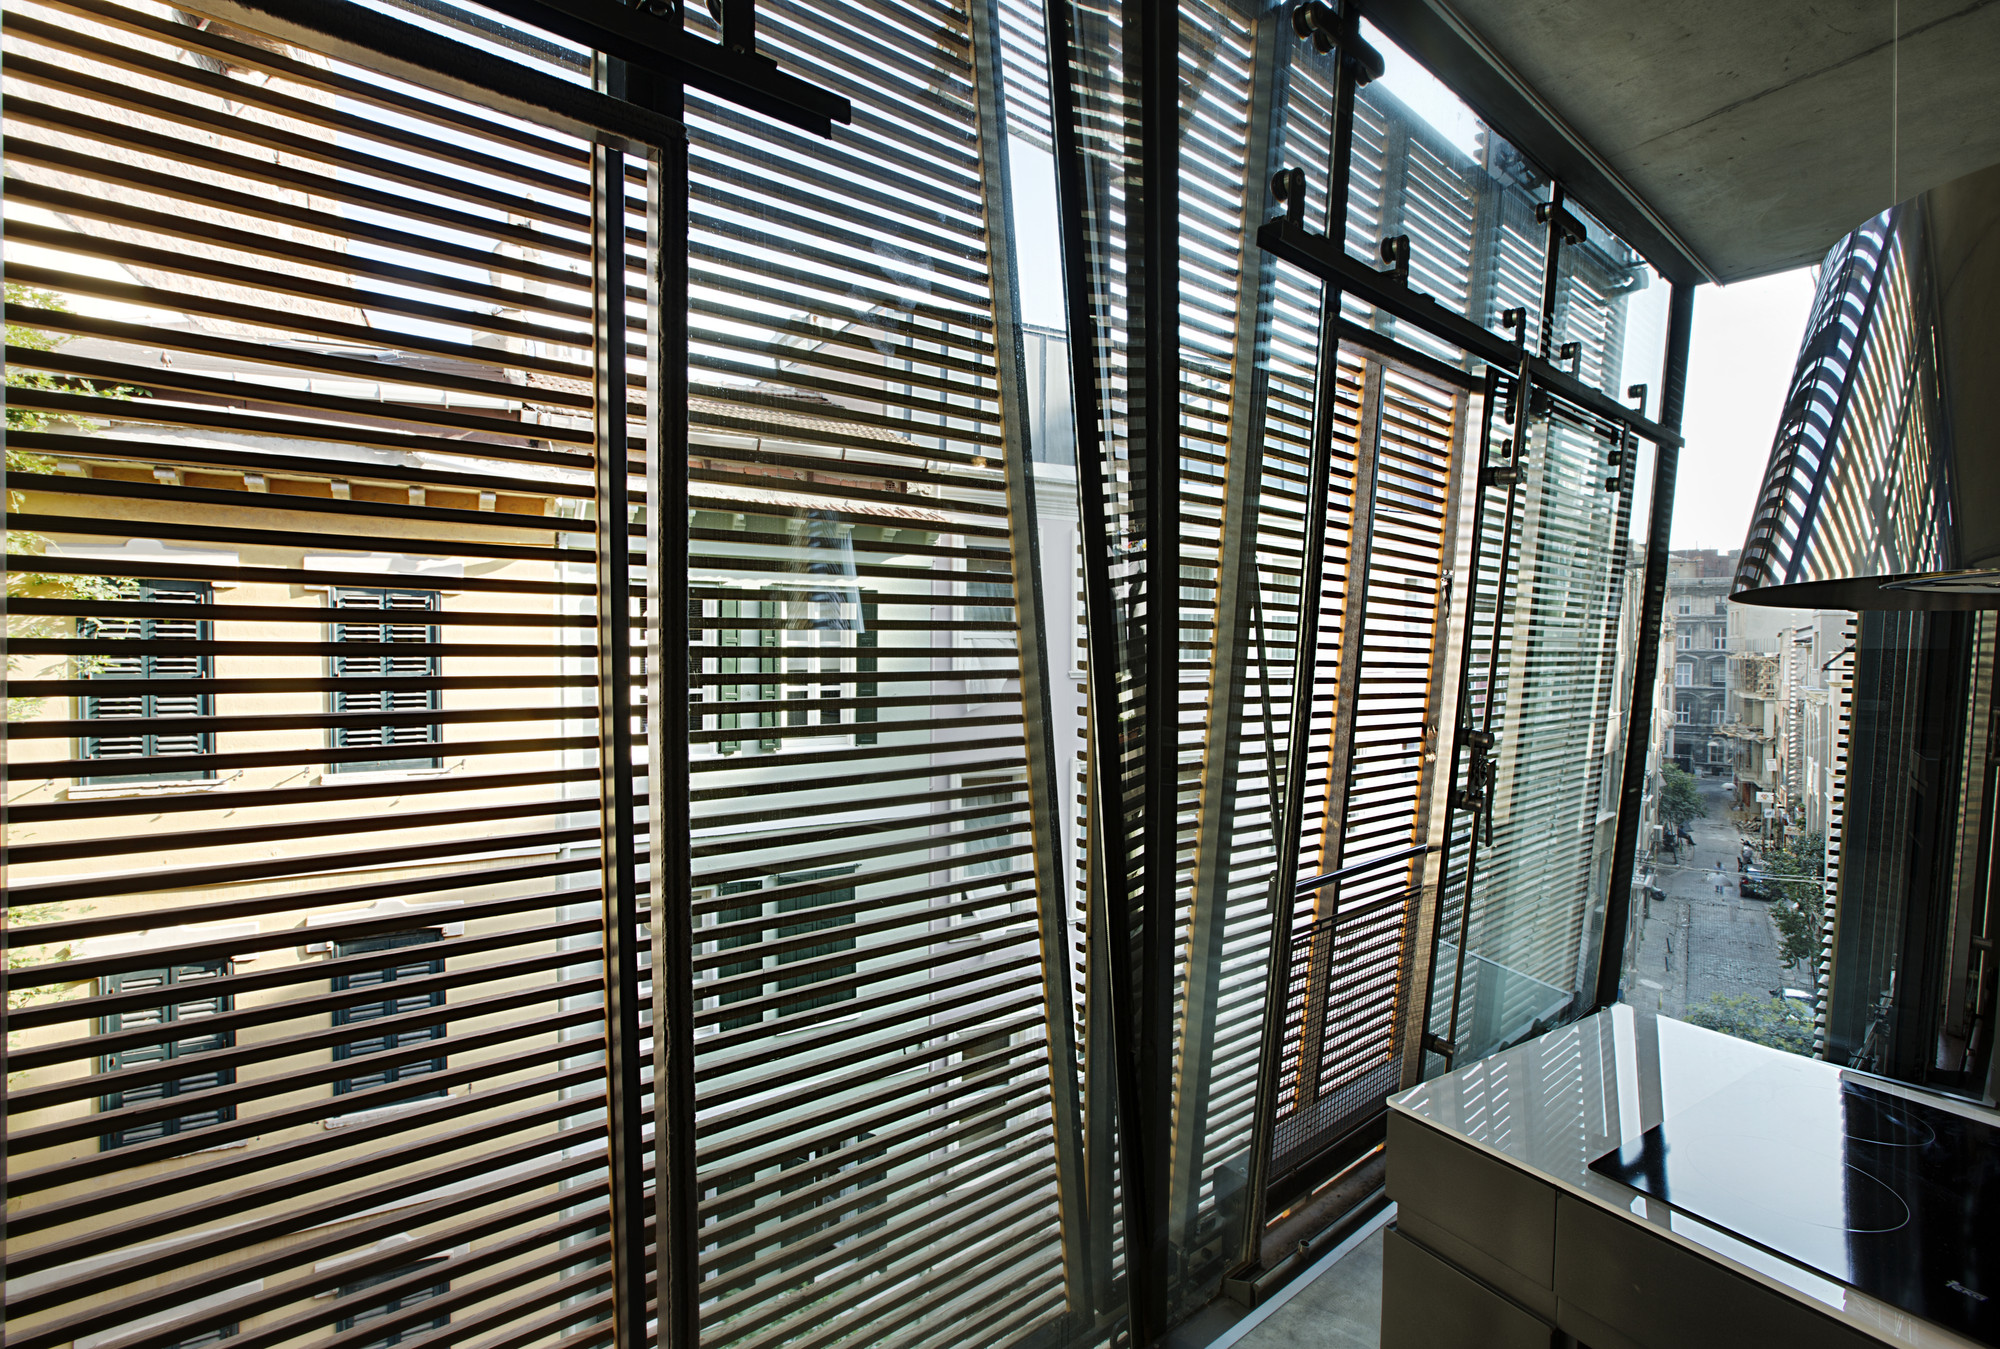 gallery of pera 25 alata architecture consulting 32. Black Bedroom Furniture Sets. Home Design Ideas